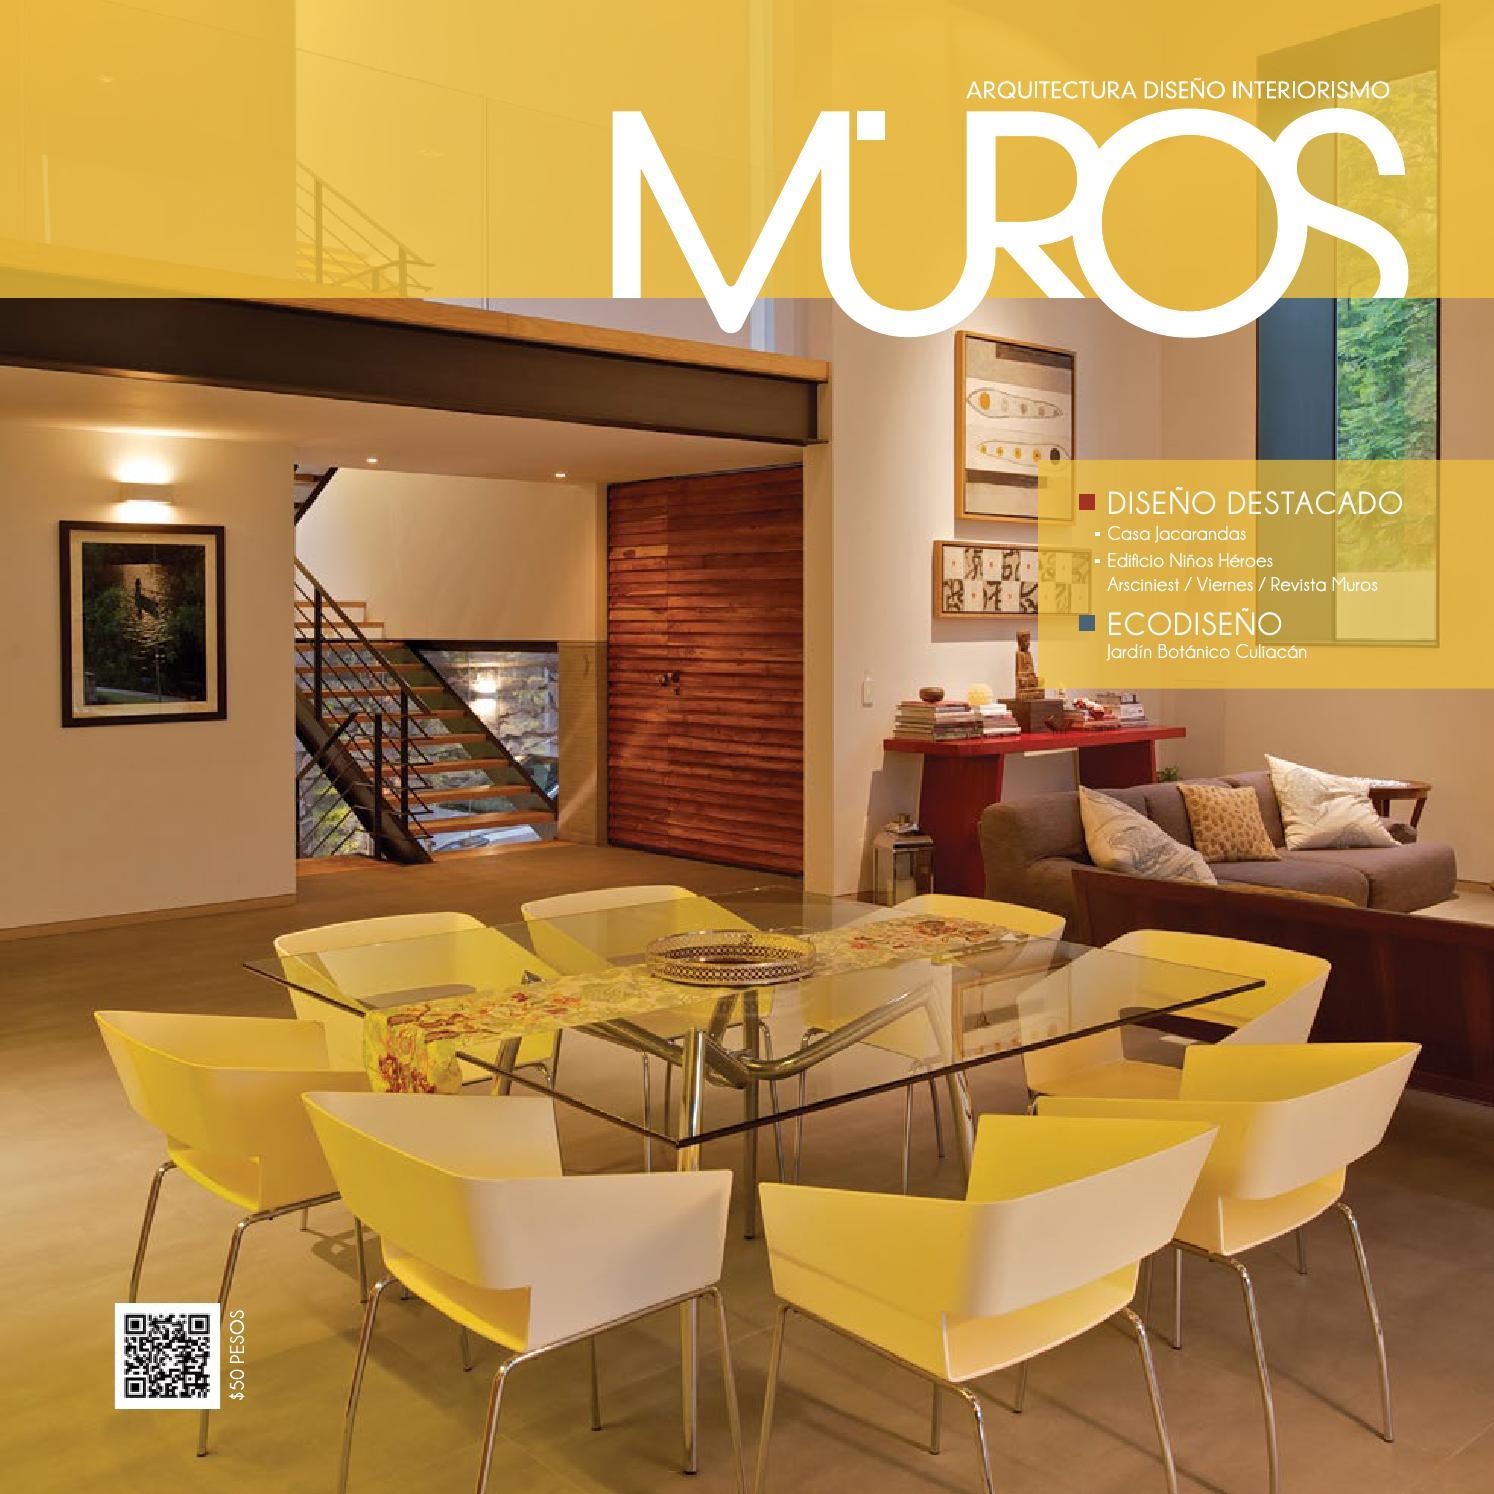 Edici n 9 revista muros arquitectura dise o interiorismo for Revista habitat arquitectura diseno interiorismo